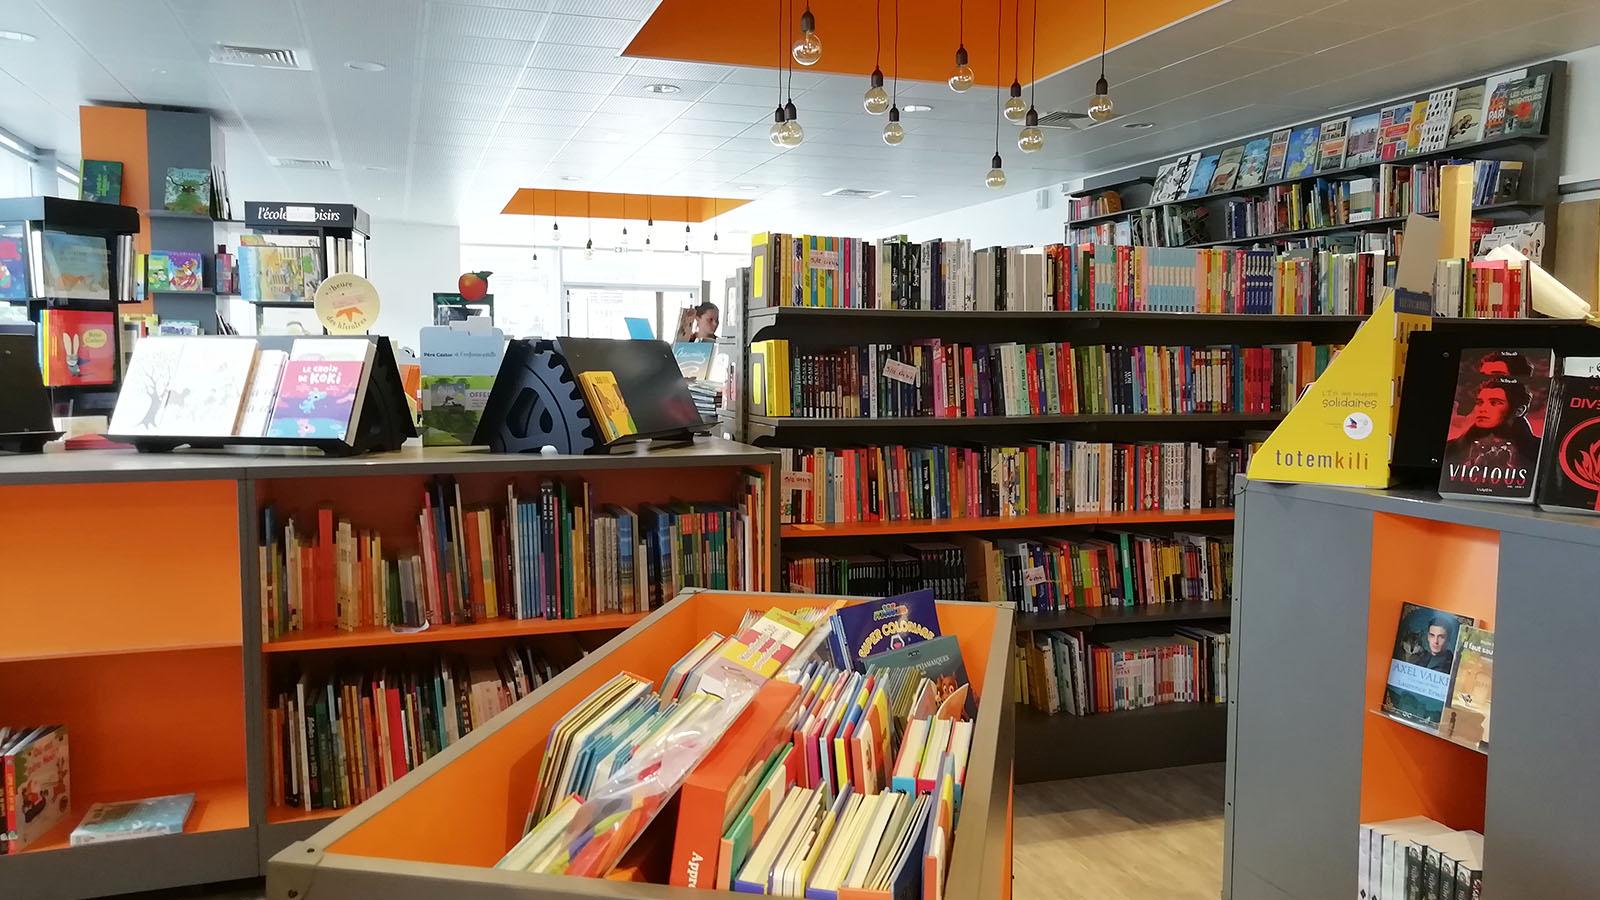 EFI Design EFI Design Librairie La Roche Sur Yon (8) 1386